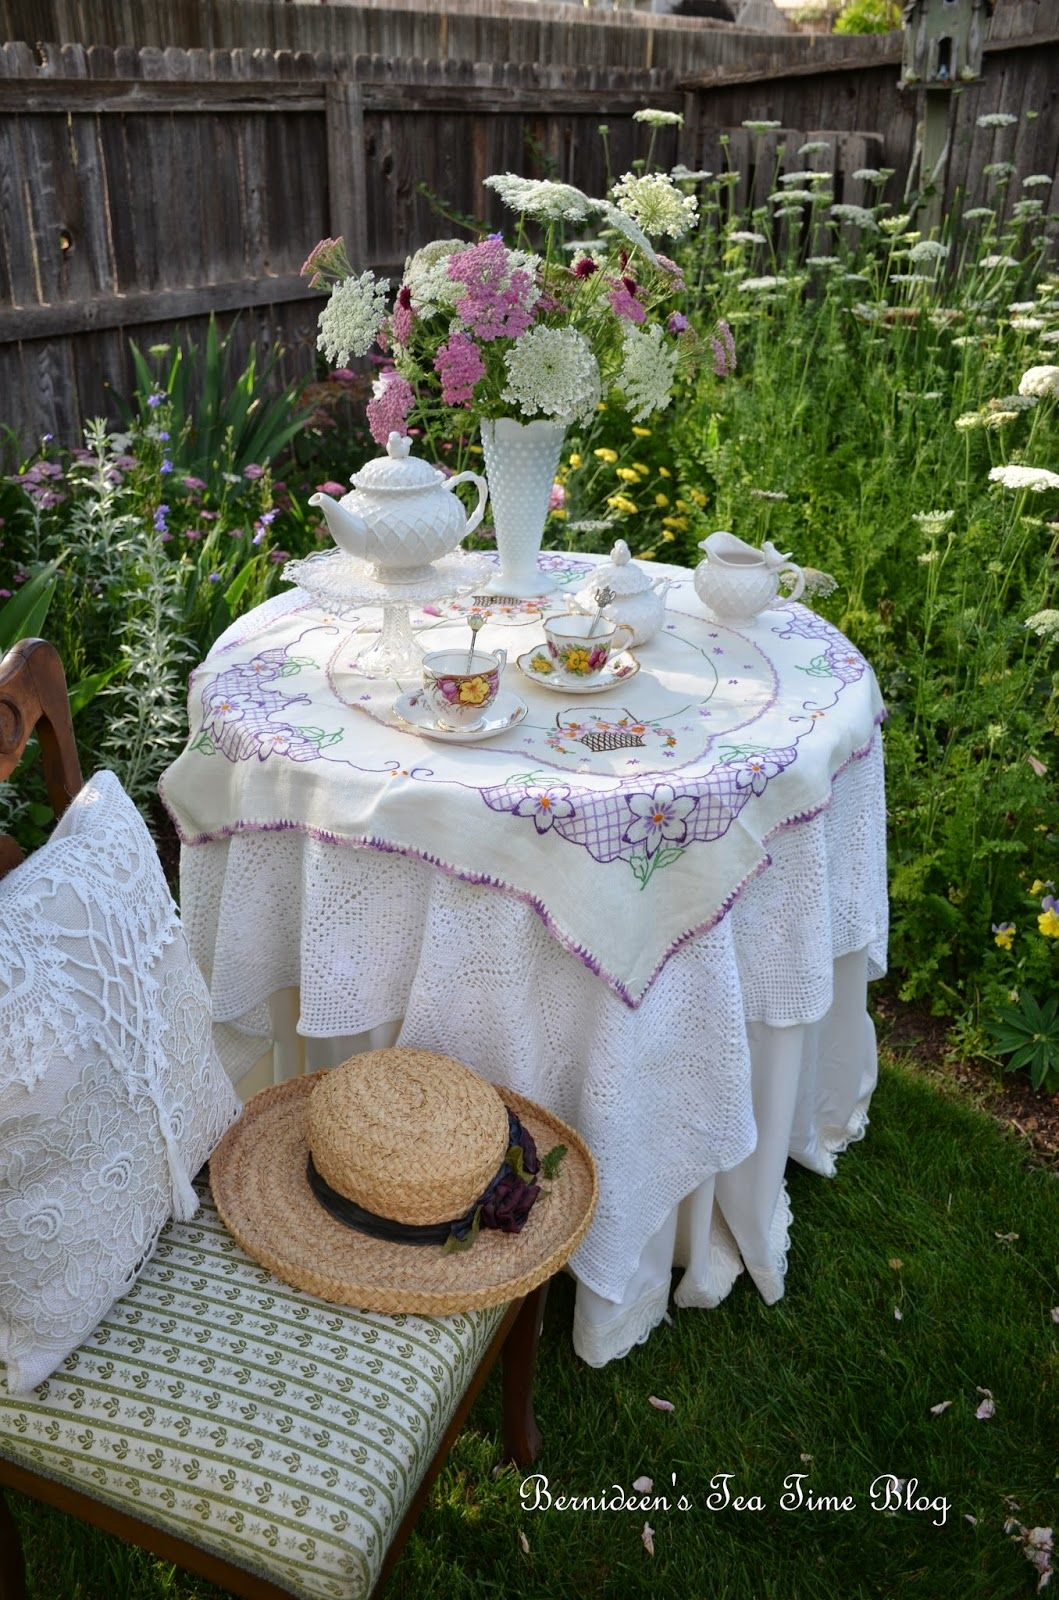 "Bernideen's Tea Time Blog: GOOD MORNING ""Tea In The Garden"""